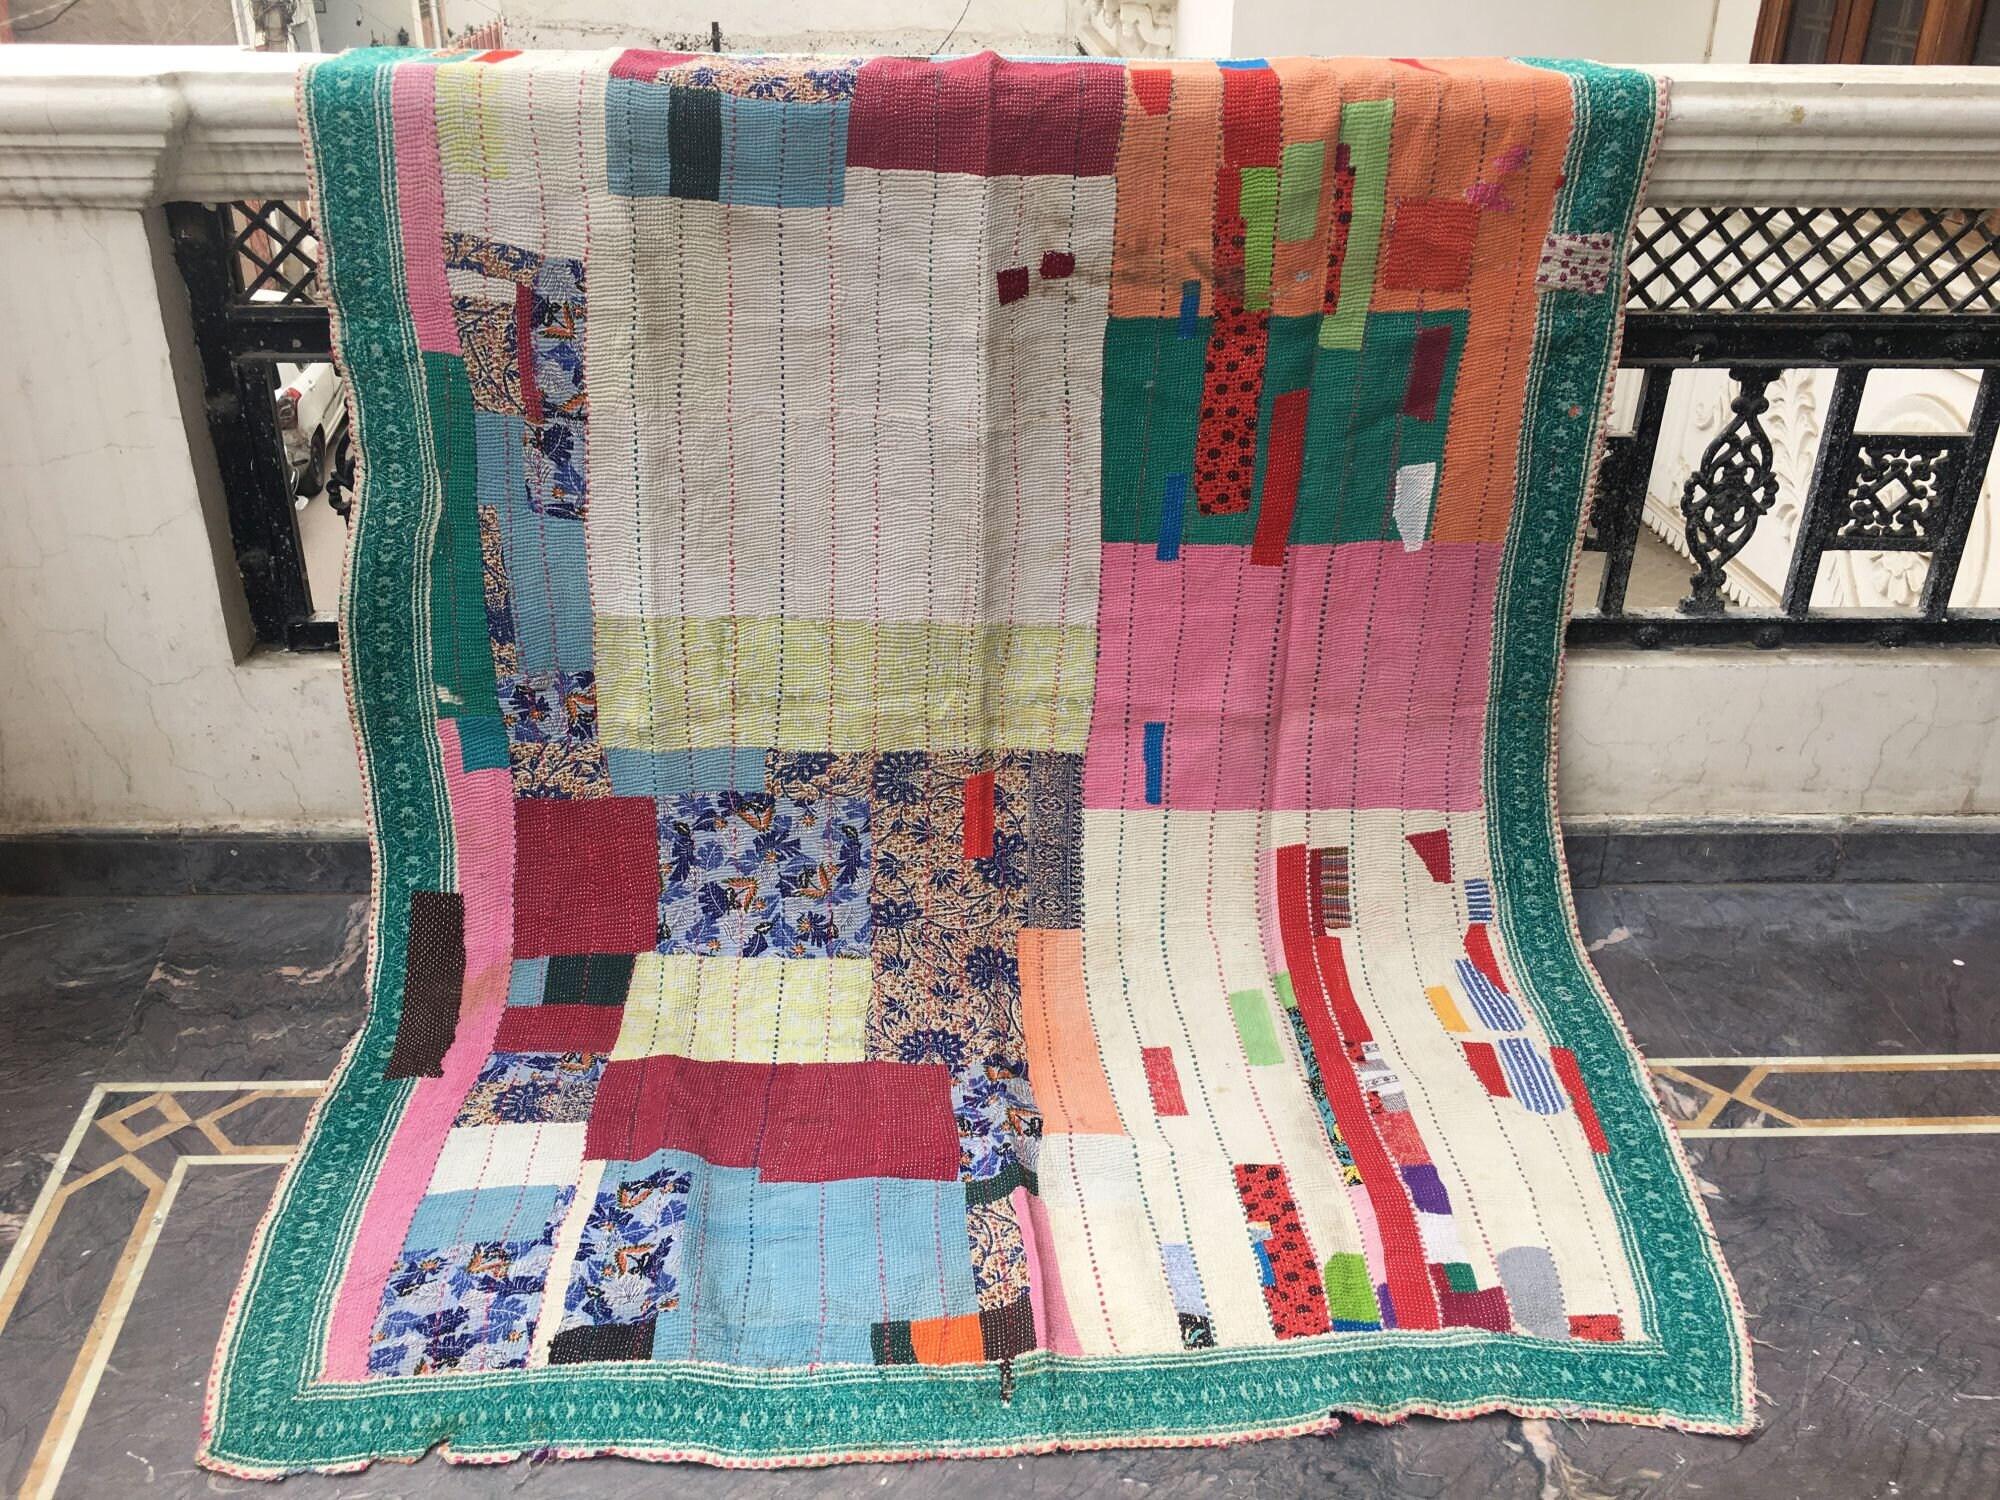 Indian Kantha Quilt, Handmade vintage Kantha Throw Blanket, Indian Cotton Quilt Recycled Gudri, Reversible Twin Kantha Blanket,vintage Throw